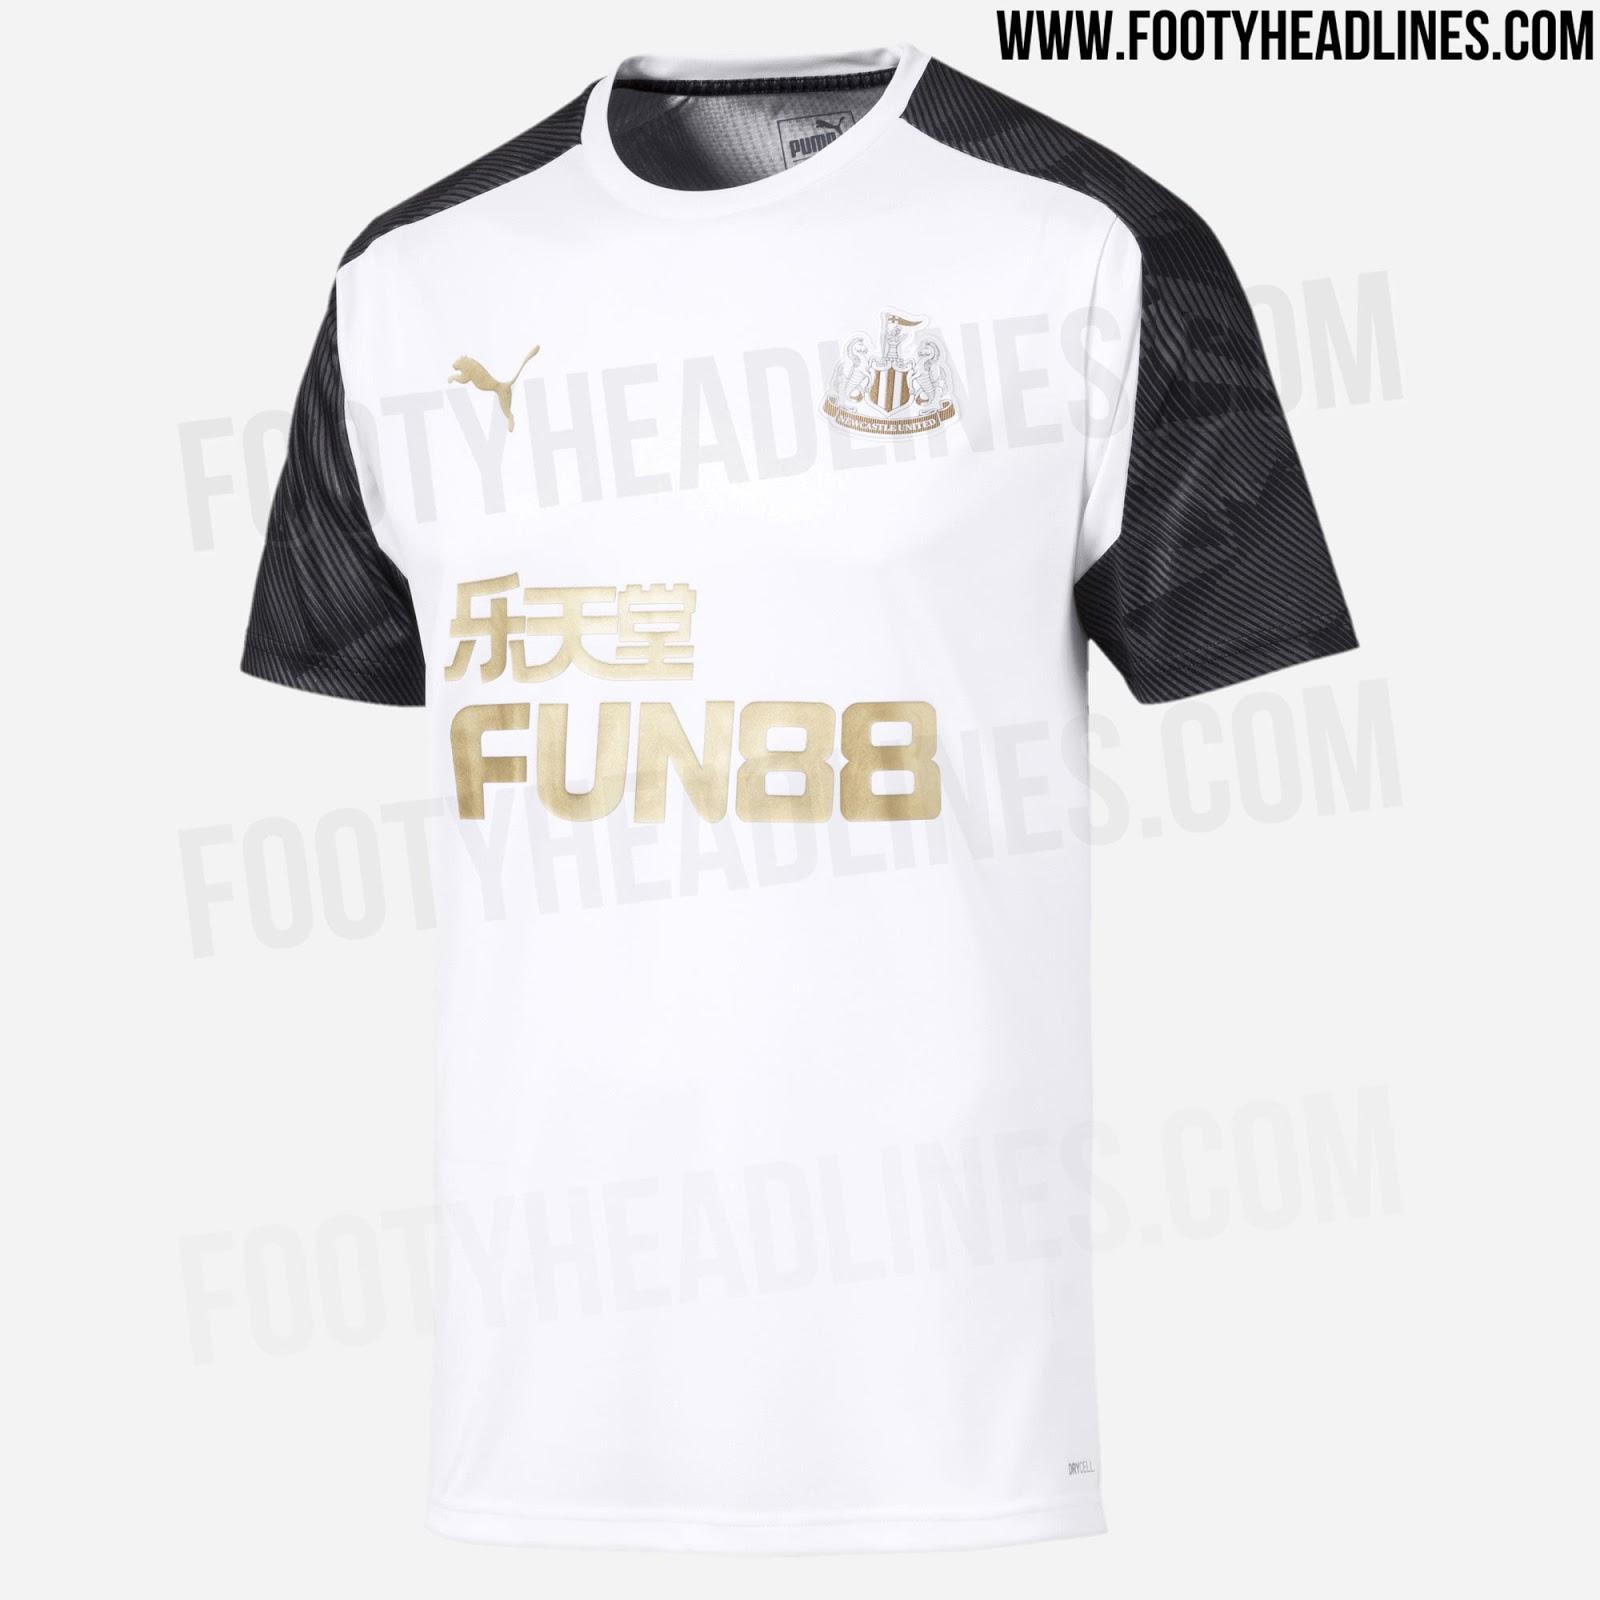 quality design 72ef4 1b57a 3 Newcastle United 19-20 Training Jerseys Leaked - cheap ...